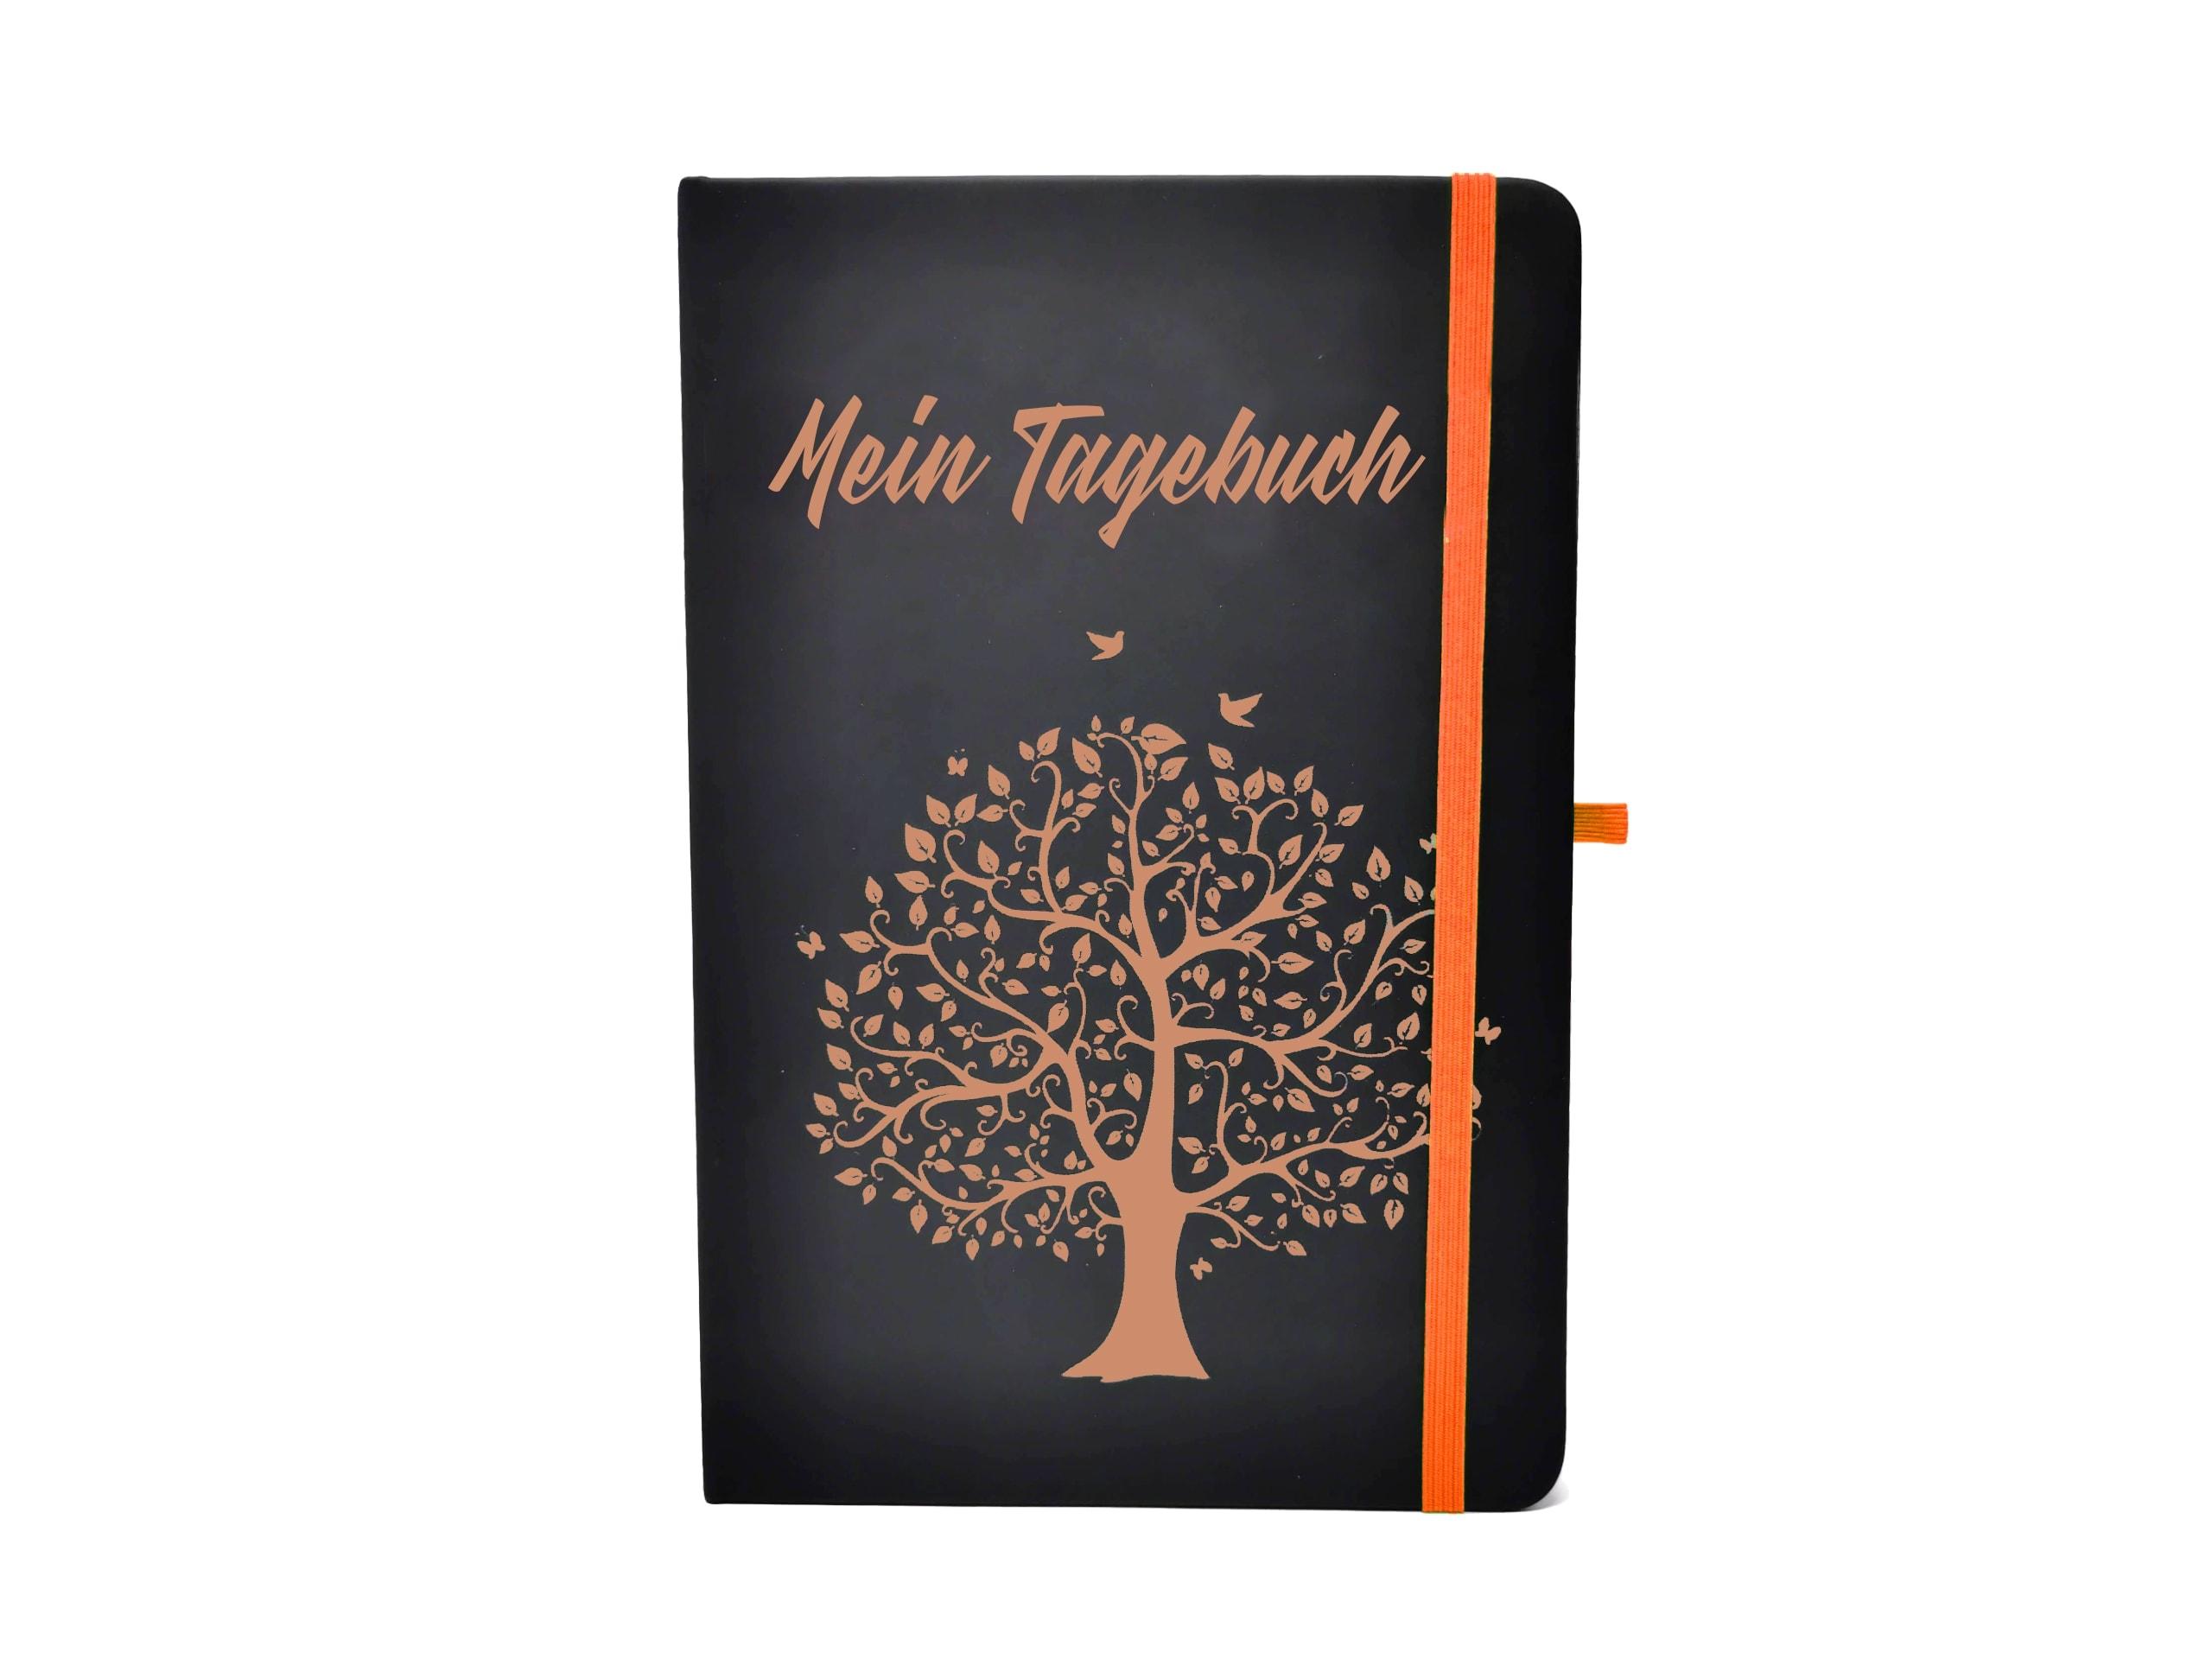 Notizbuch farbige Gravur orange